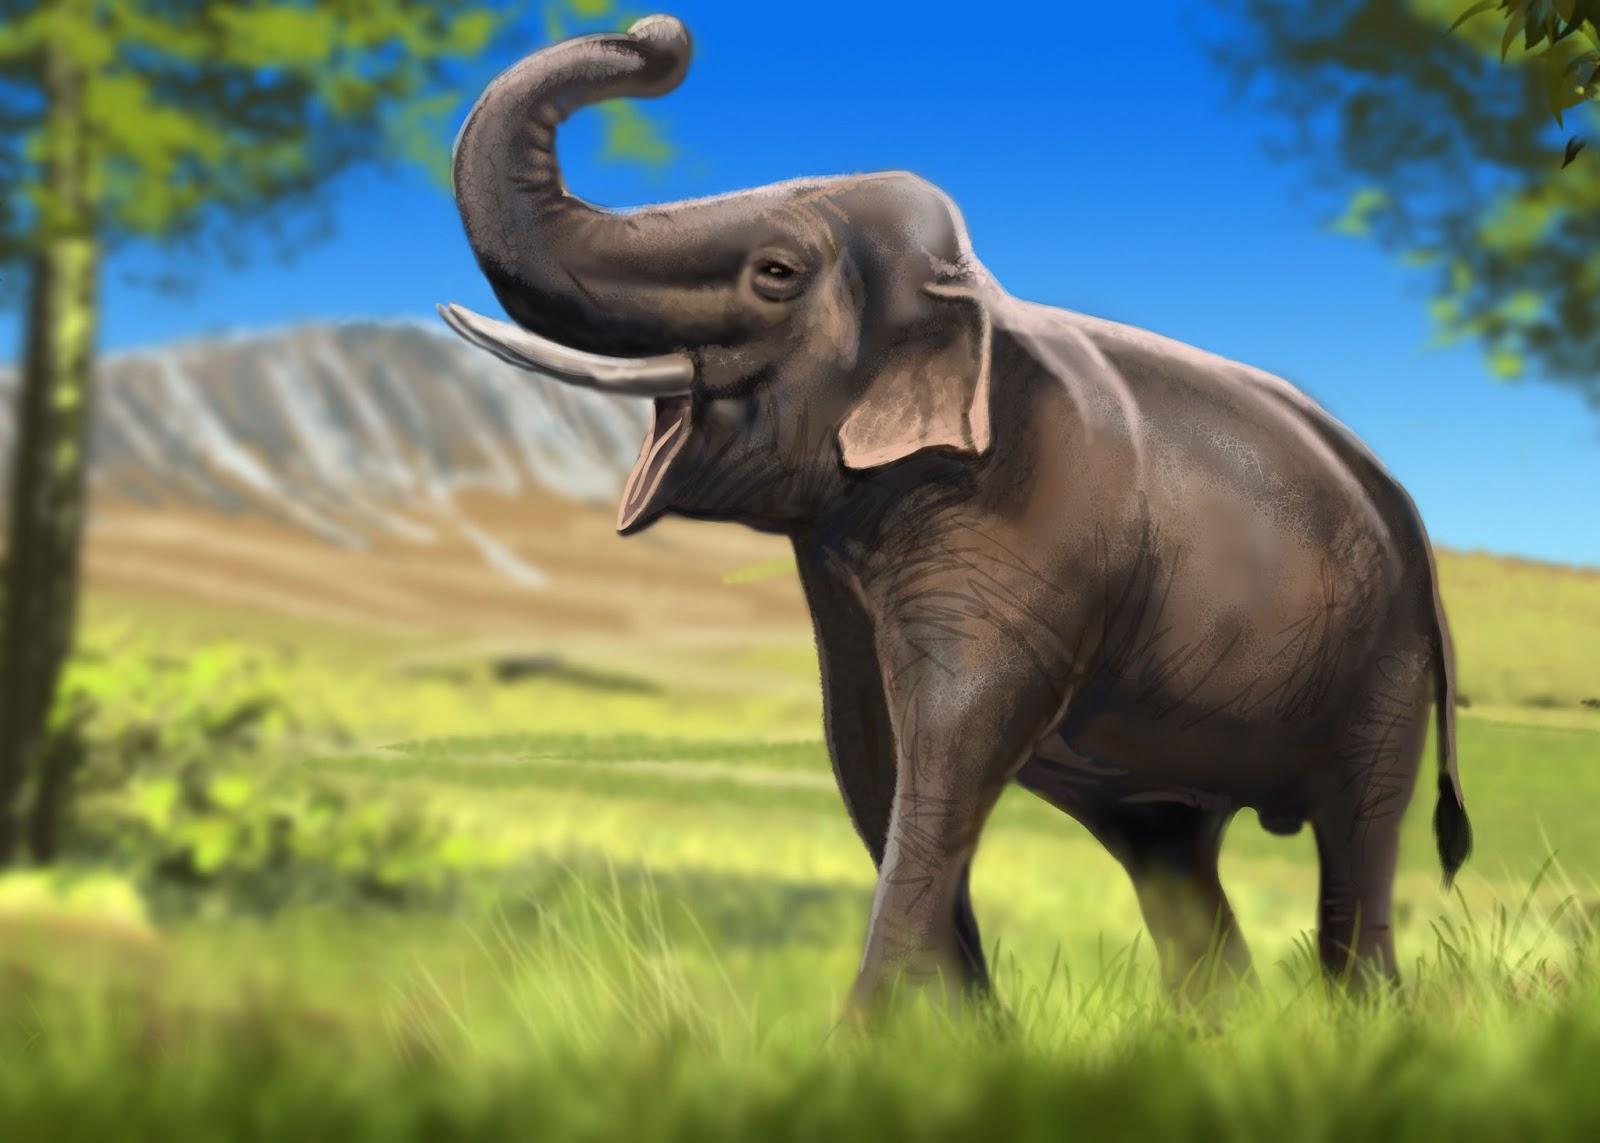 Zoo Park: Run Your Own Animal Sanctuary: The Indian Elephant